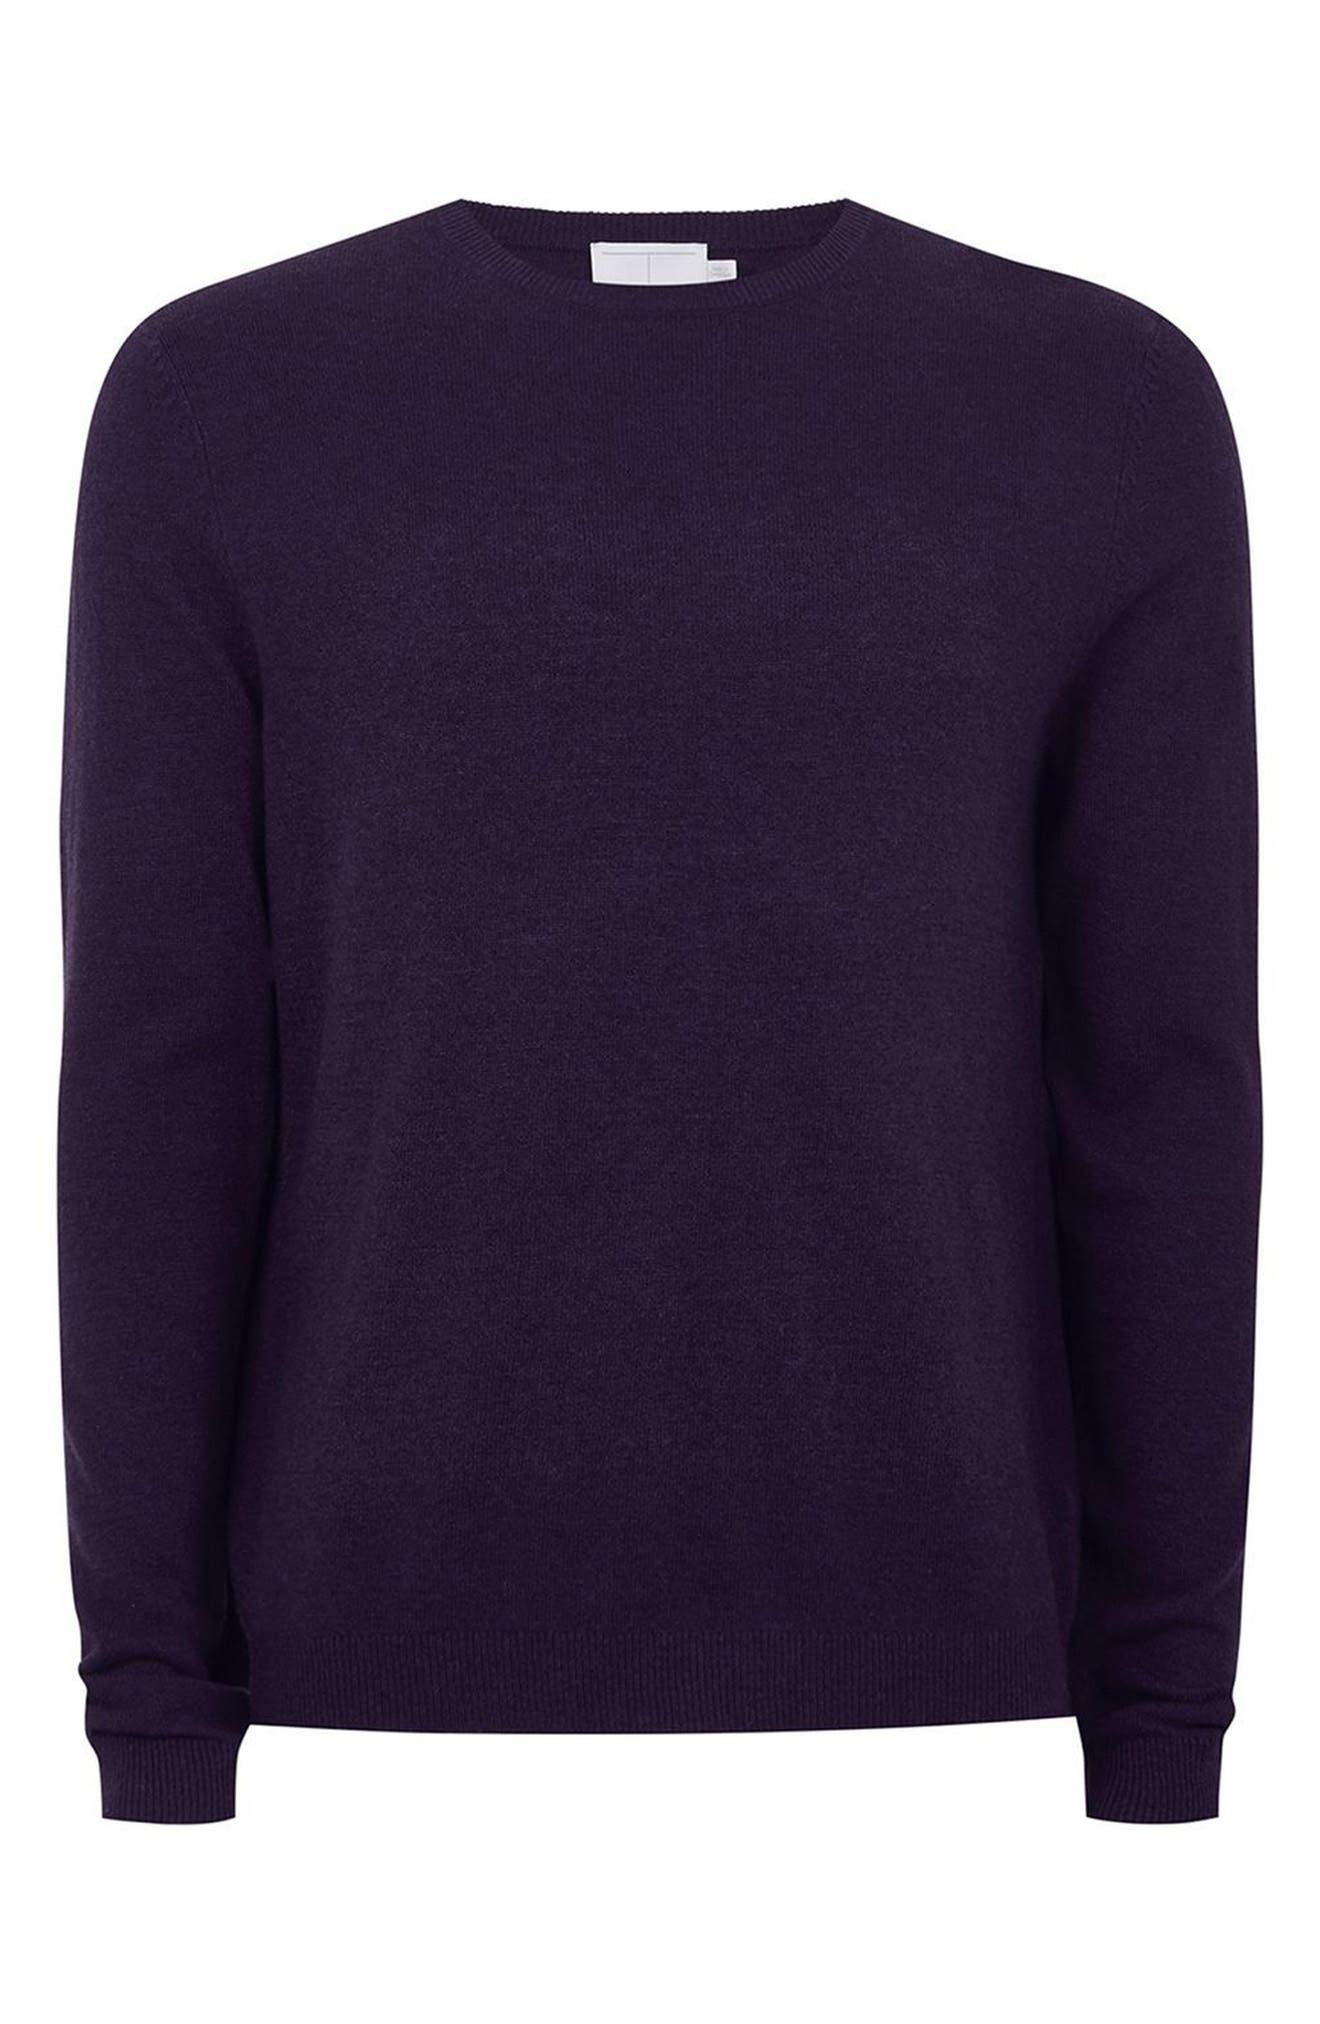 Slim Fit Crewneck Sweater,                             Alternate thumbnail 4, color,                             Dark Purple